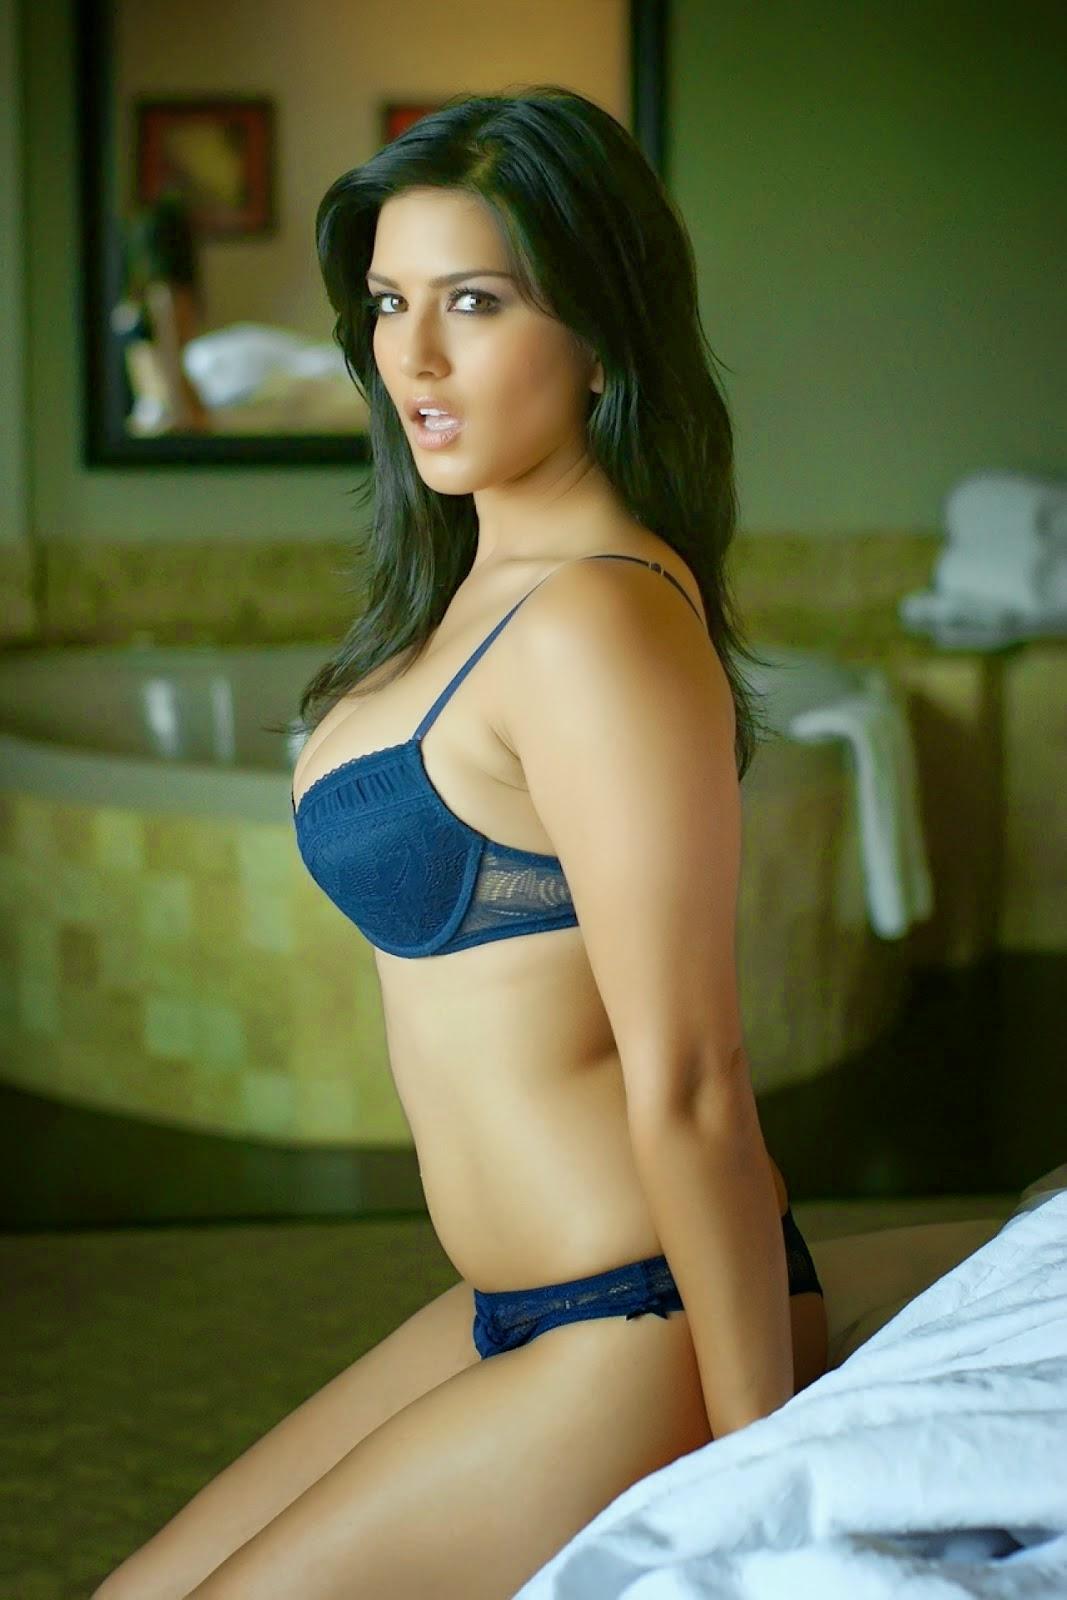 real amateur mature nude skinny tight